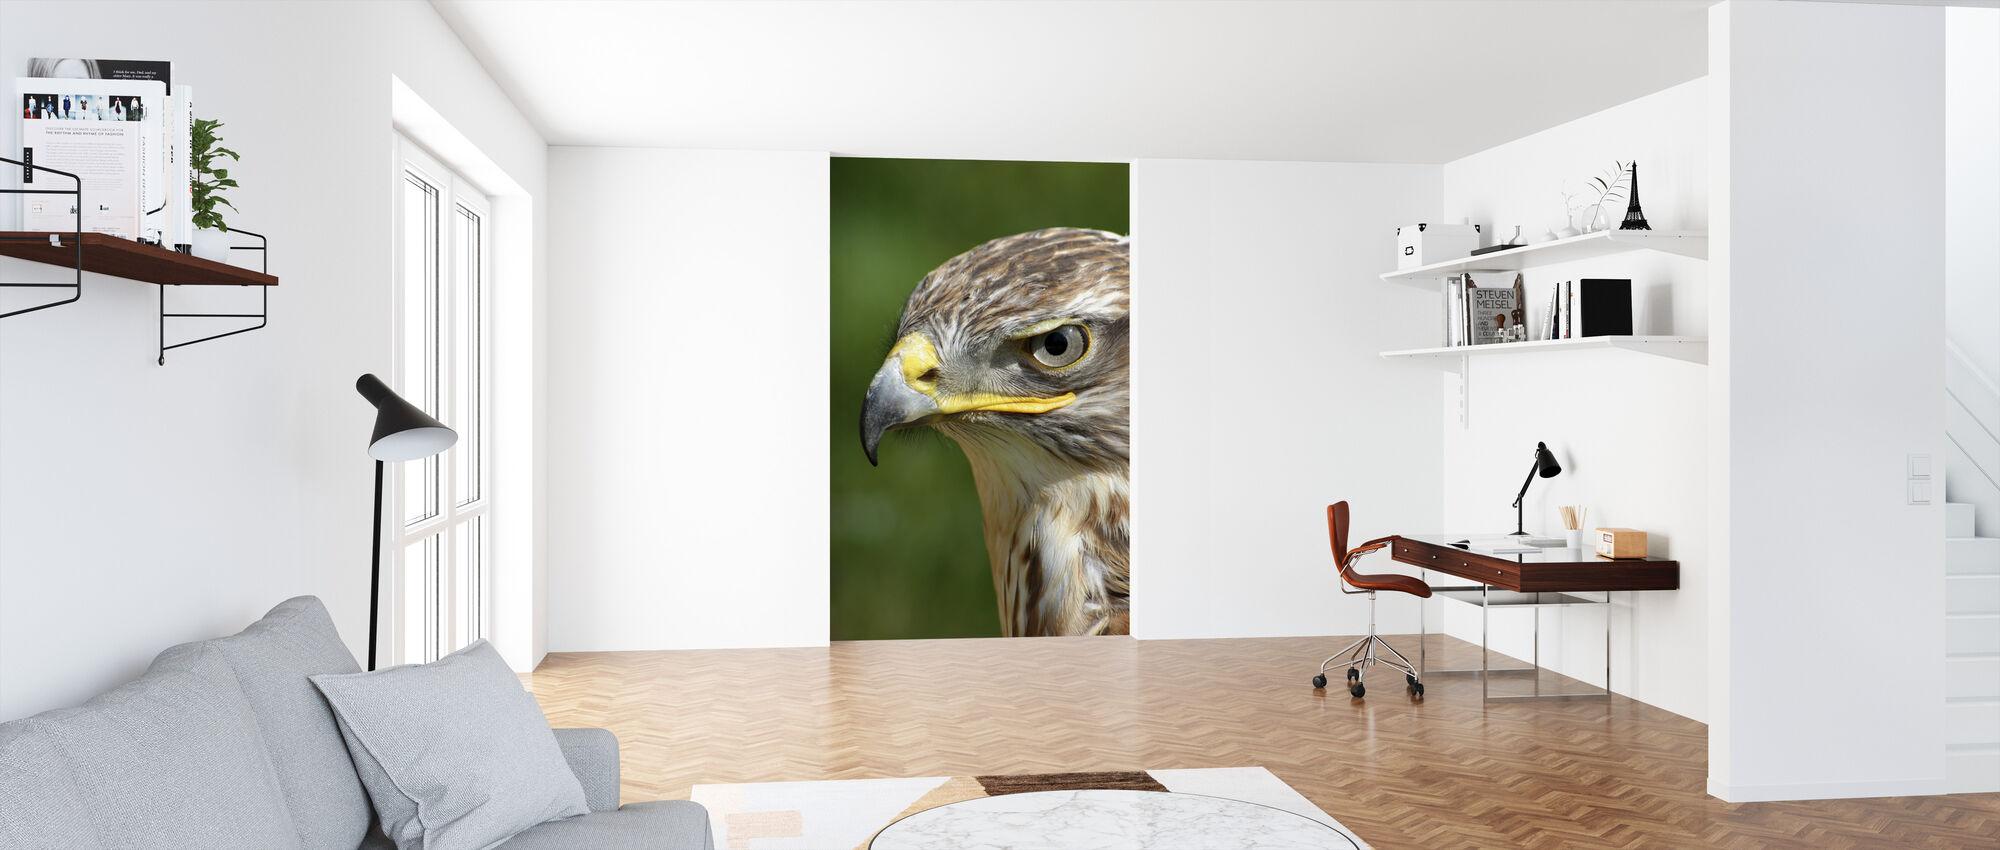 Raptor - Wallpaper - Office